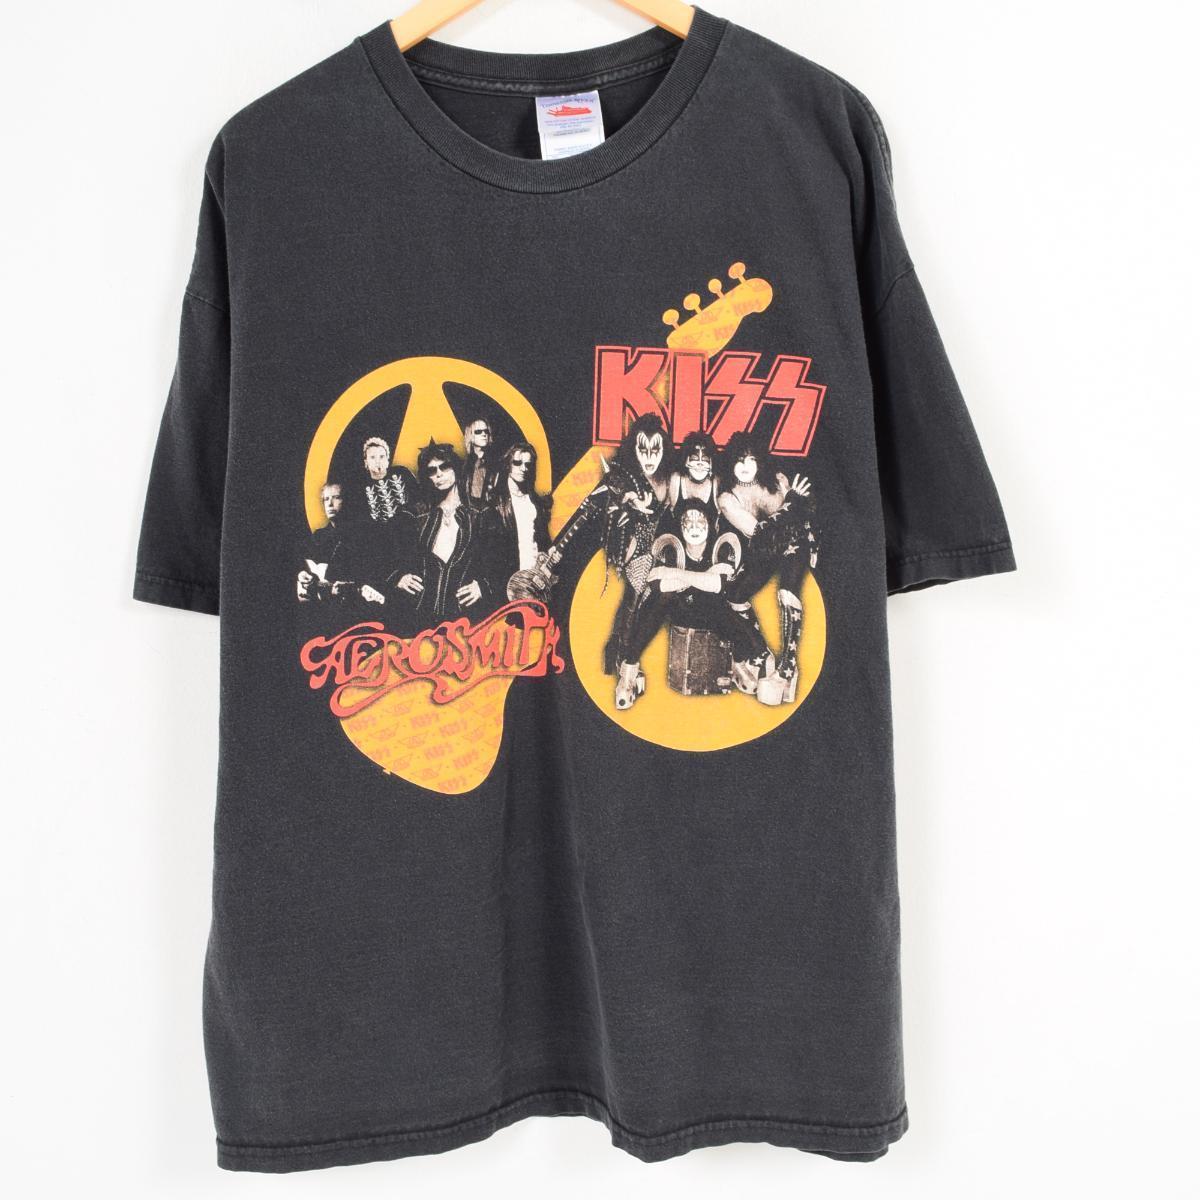 de Talla L T Camisas Maiden Ropa Shirt Iron hombres trBQdshxC